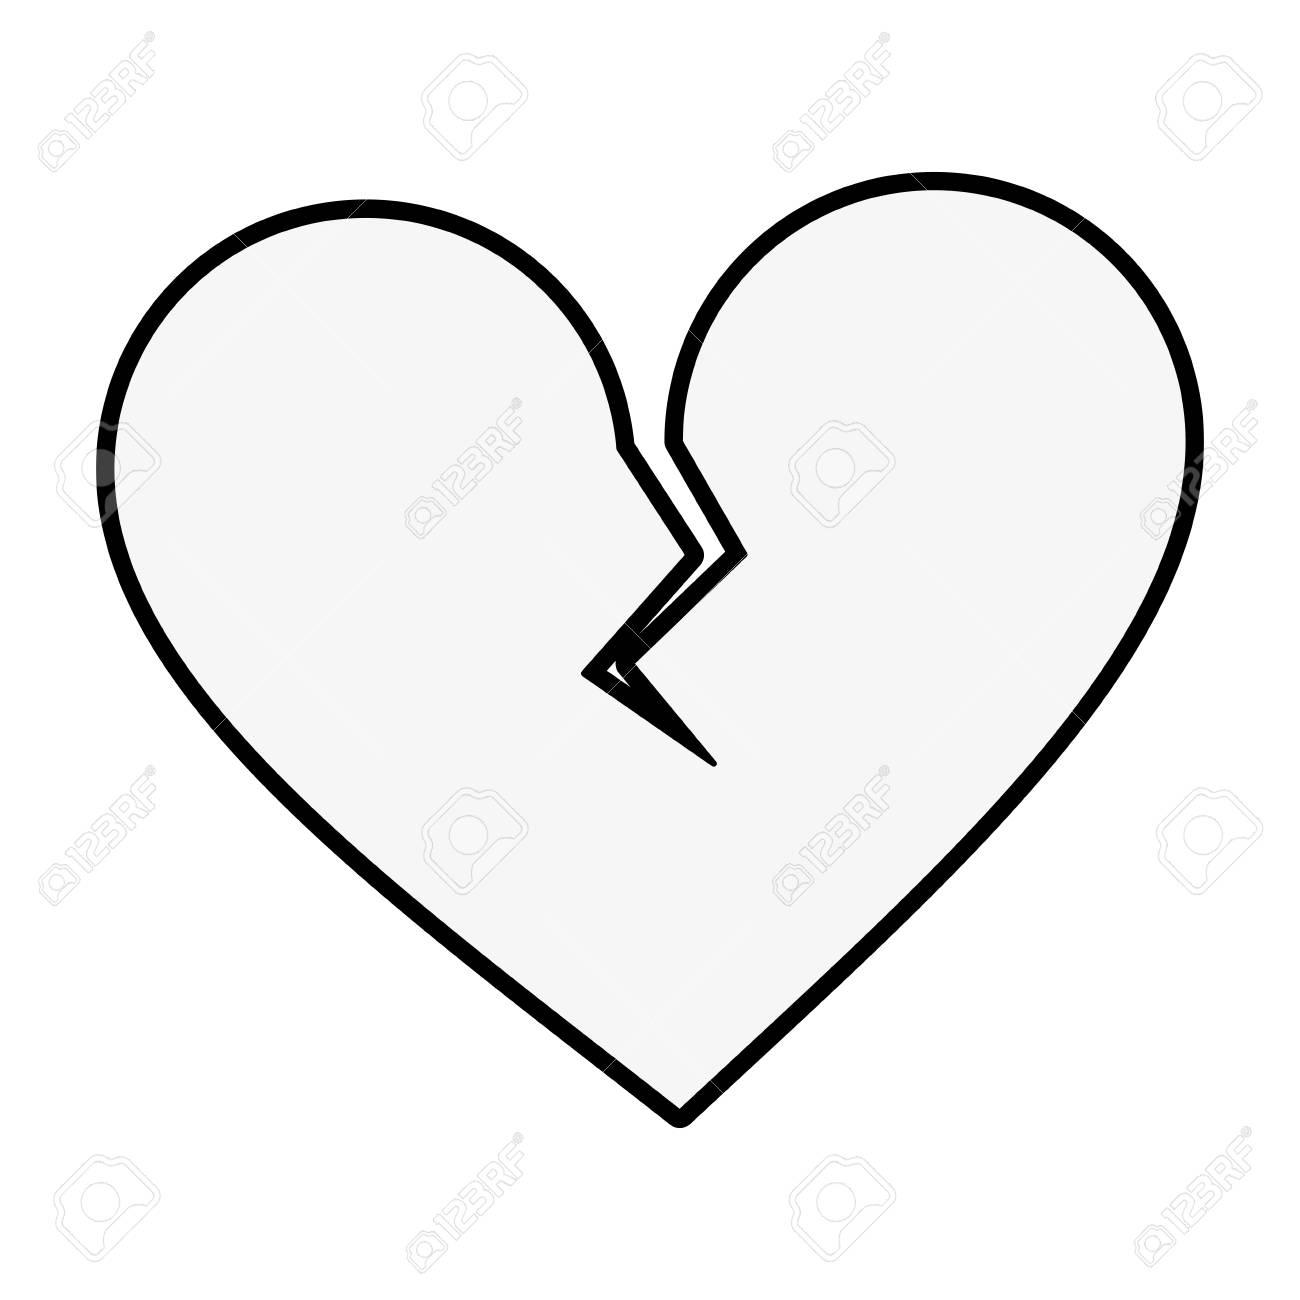 Coeur Brise Dessin Anime Icone Image Vector Illustration Design Noir